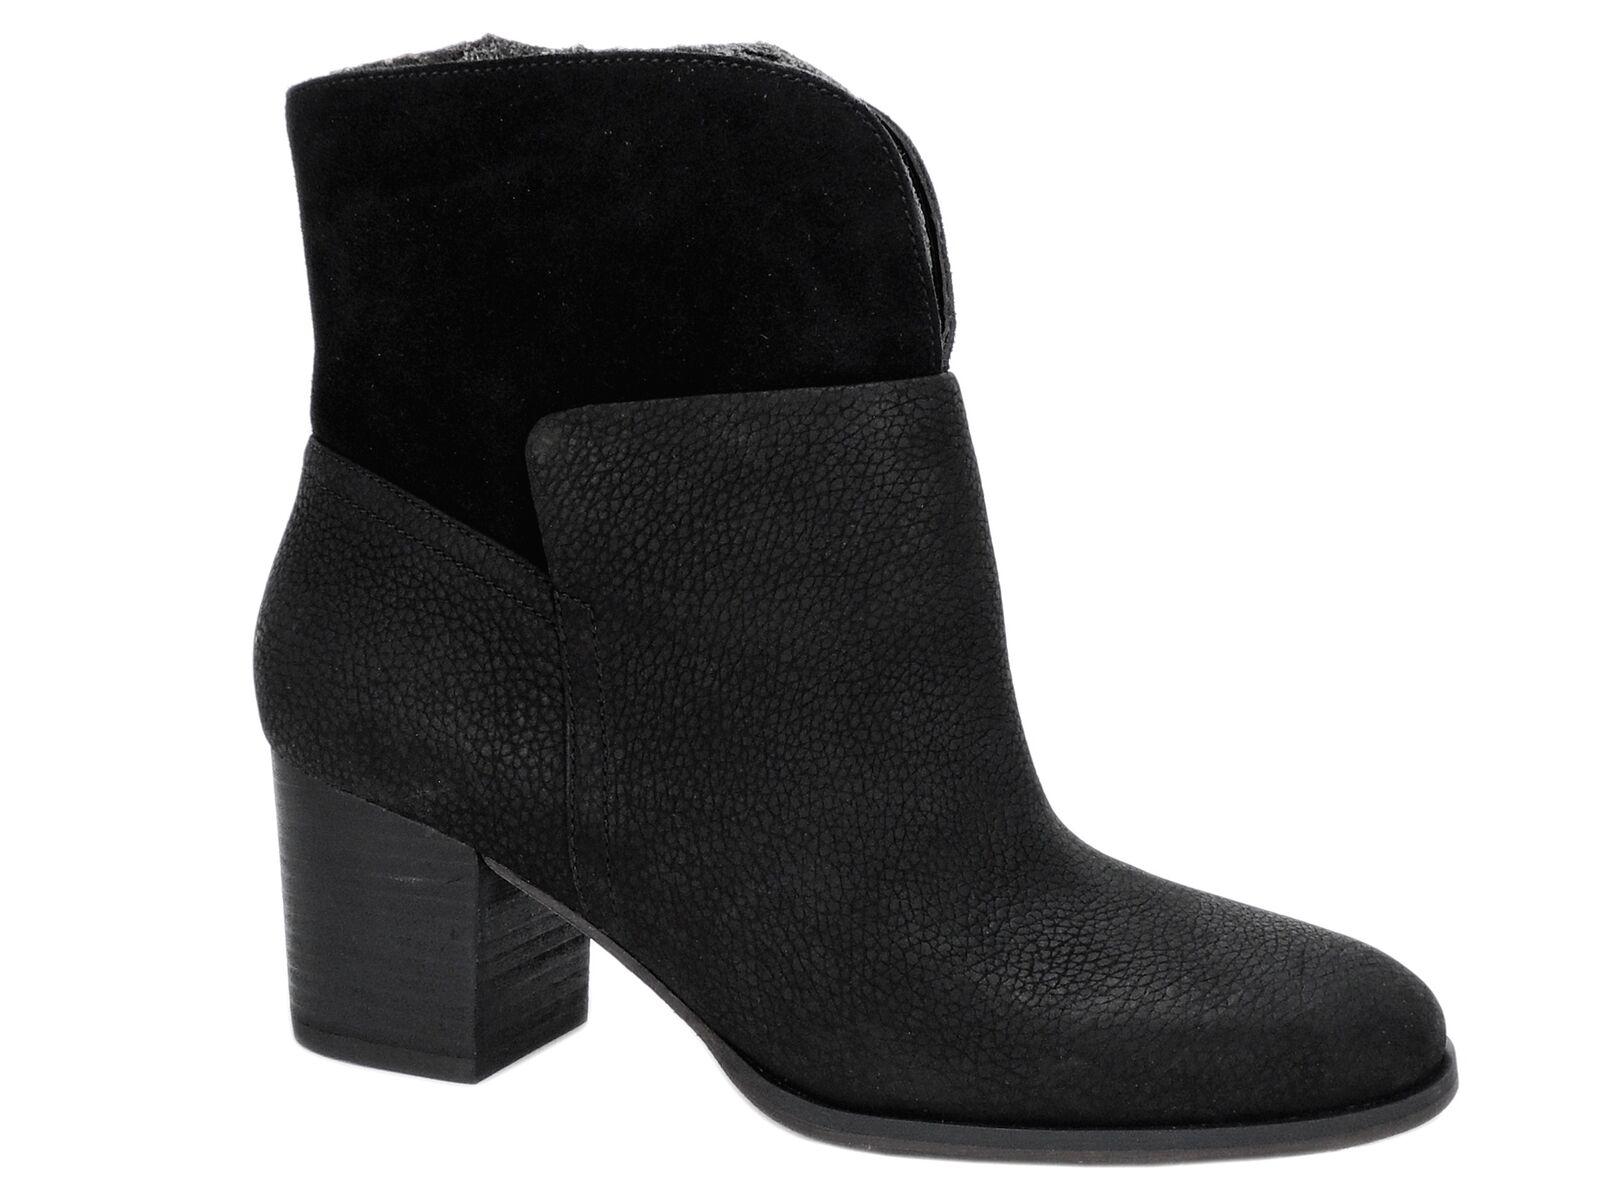 Nine West Women's Dale Block-Heel Booties Black Leather Size 9.5 M